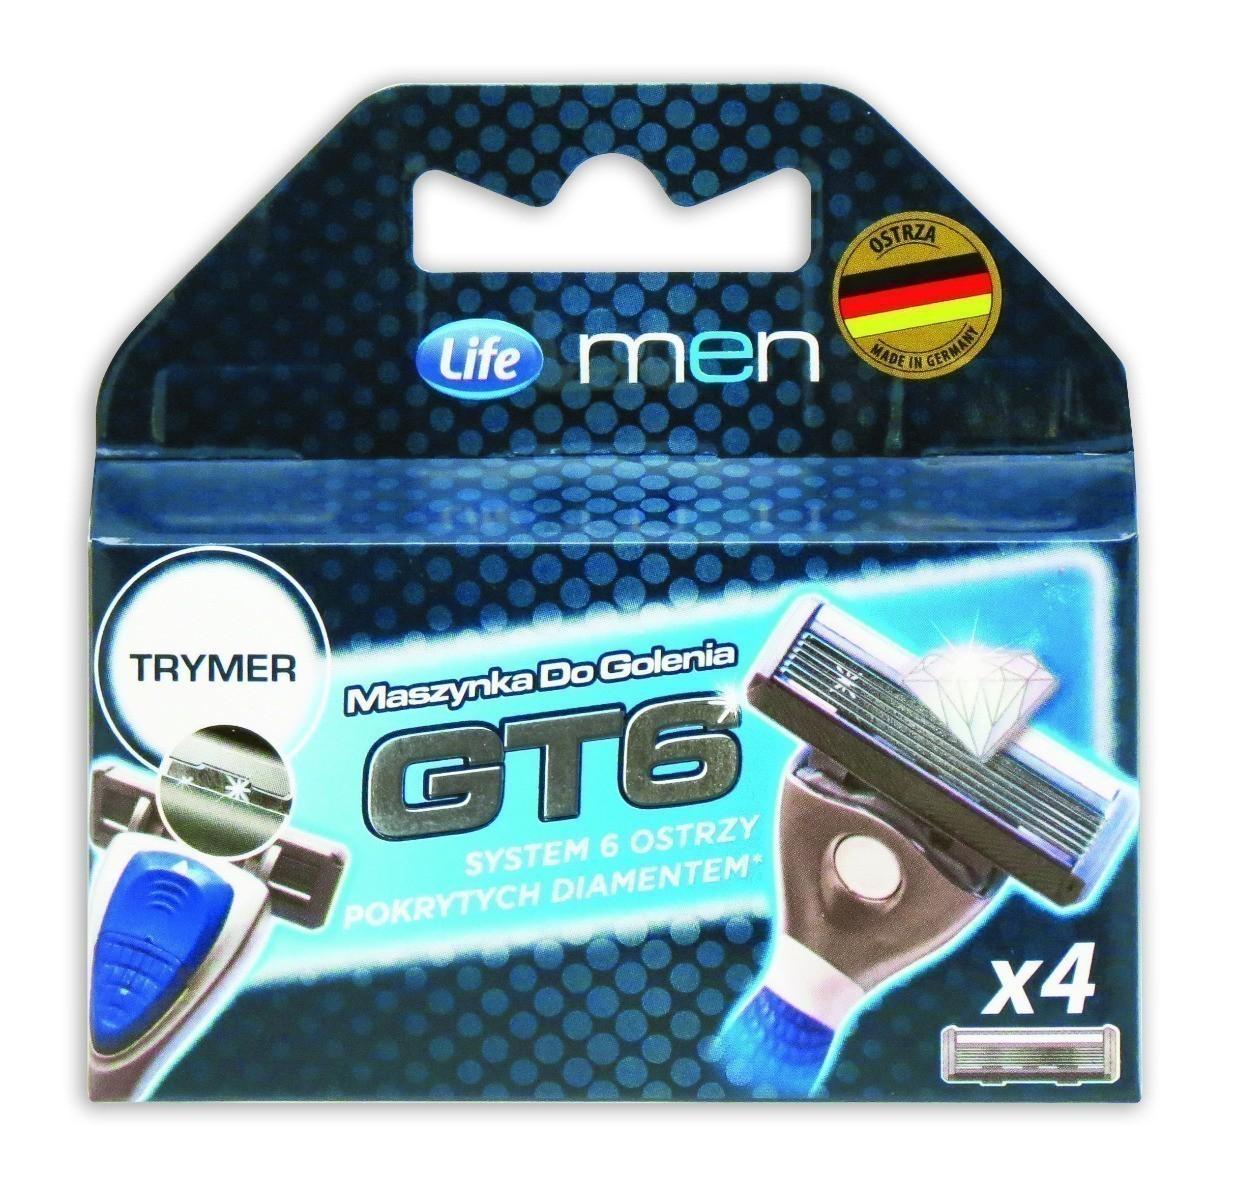 Life Men GT6 Refills